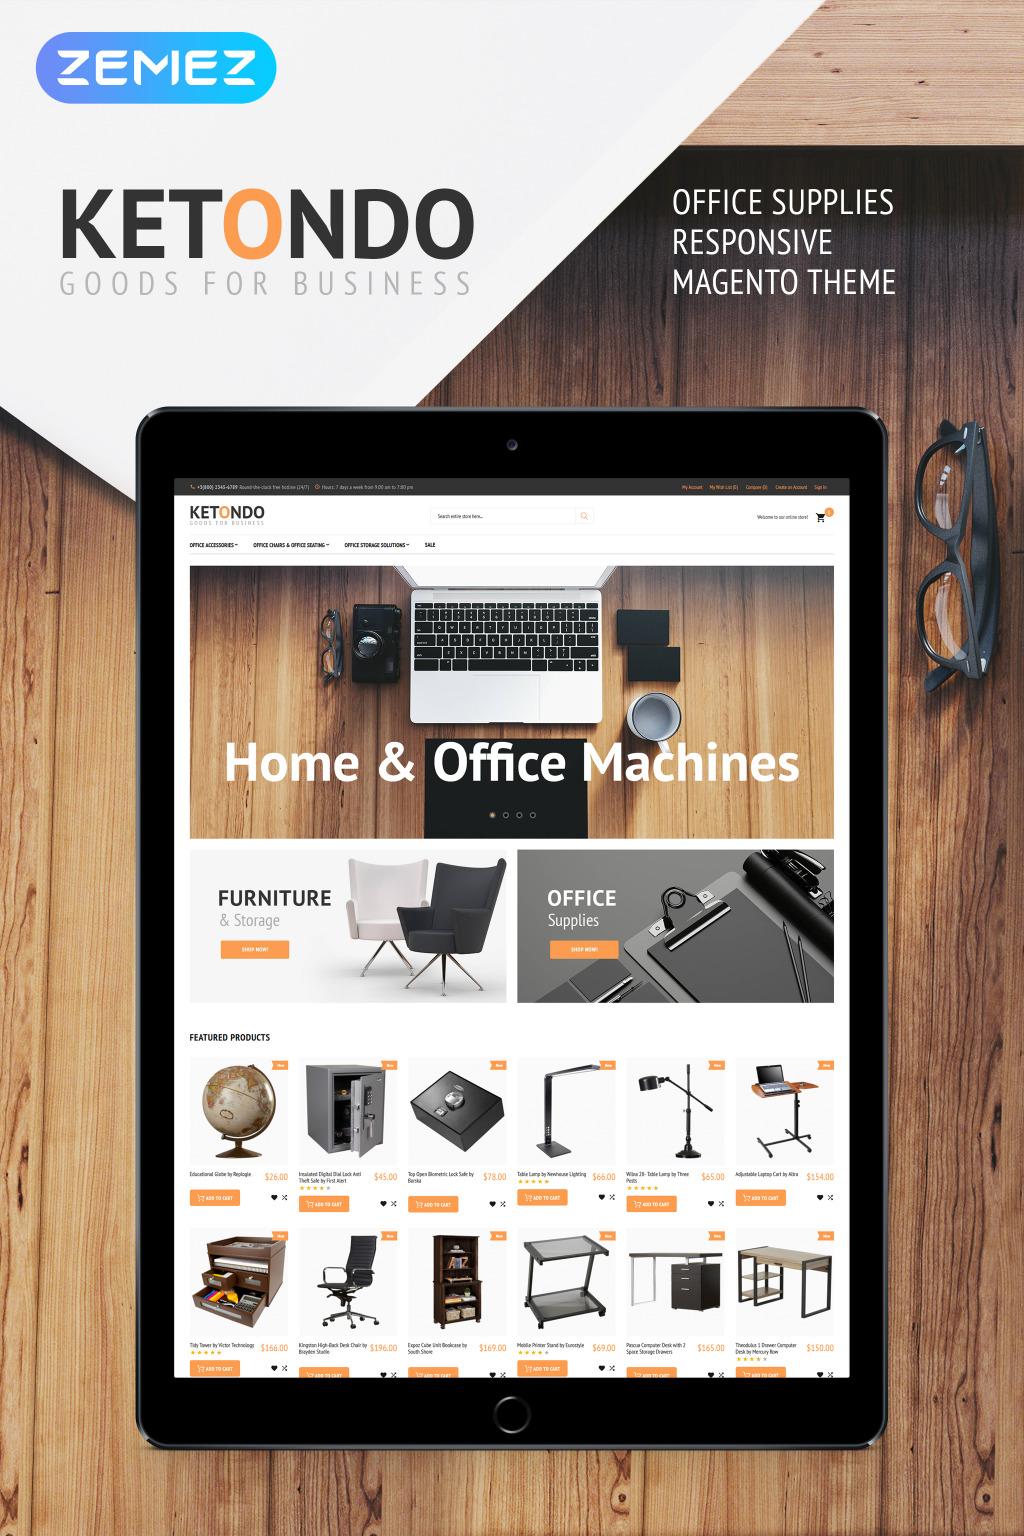 Ketondo - Office Supplies Magento Theme New Screenshots BIG